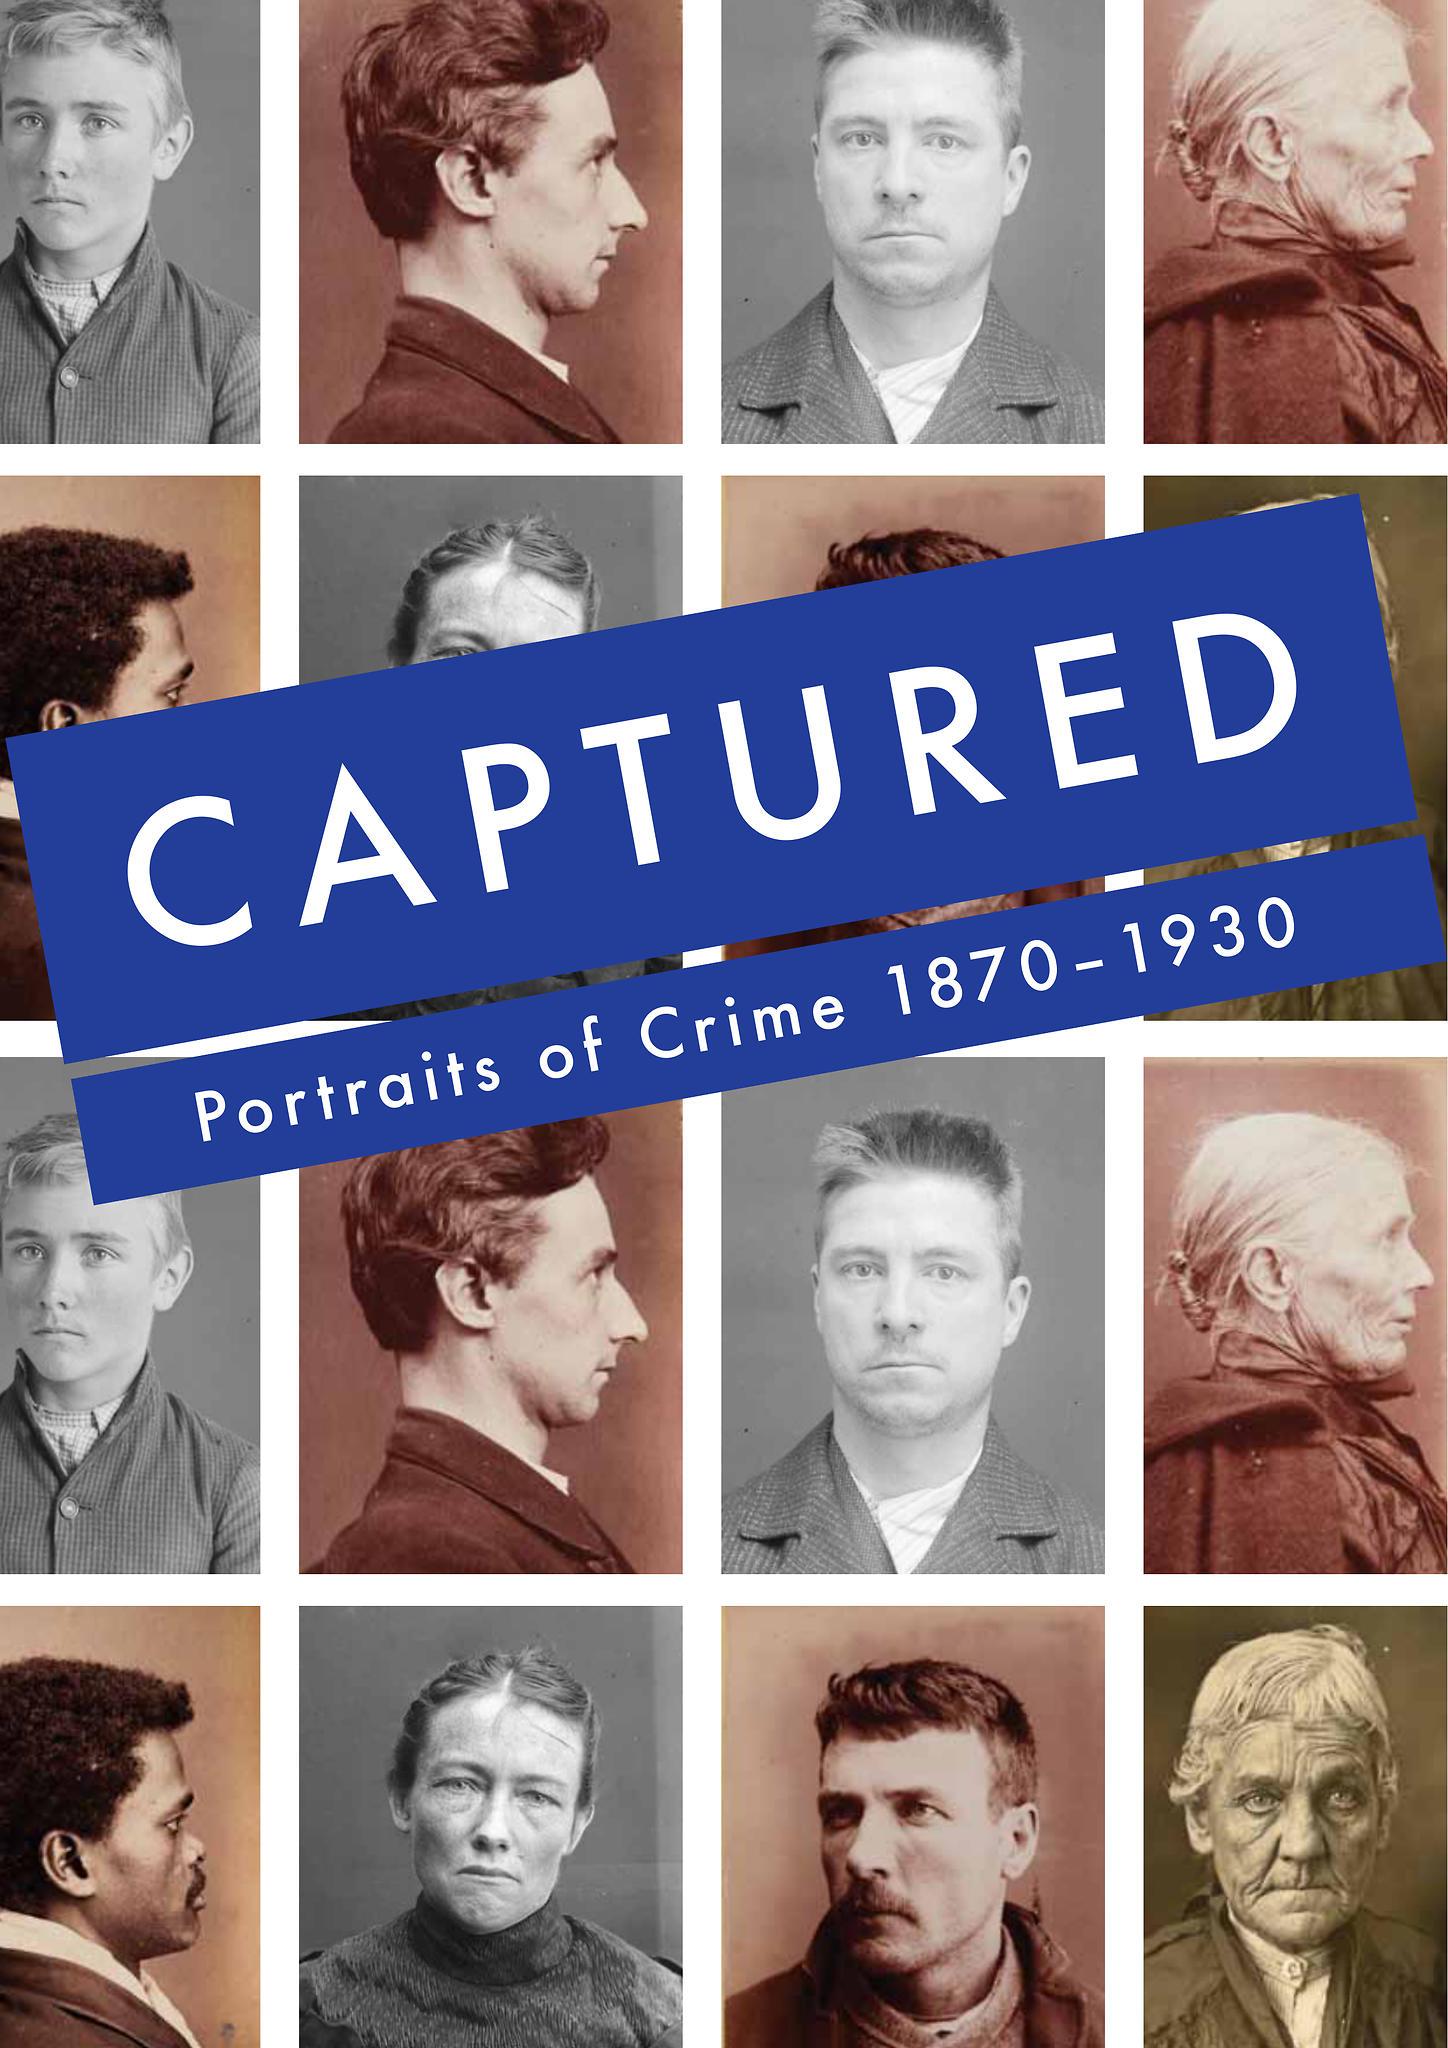 Captured: Portraits of Crime 1870-1930